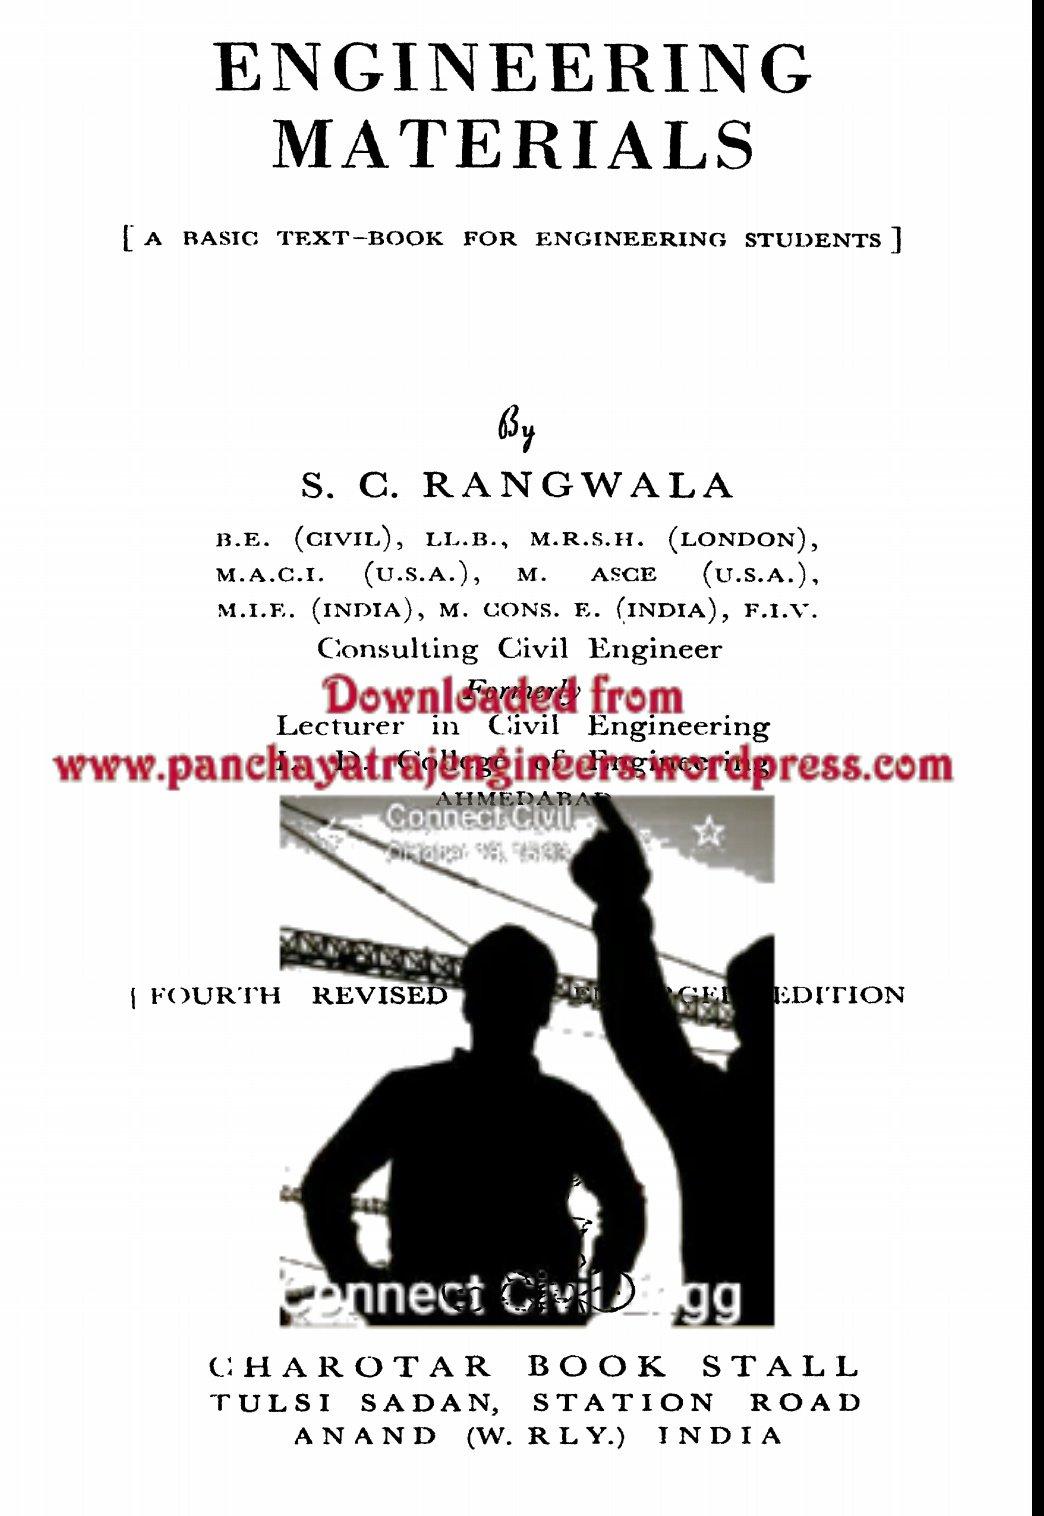 Materials rangwala pdf engineering